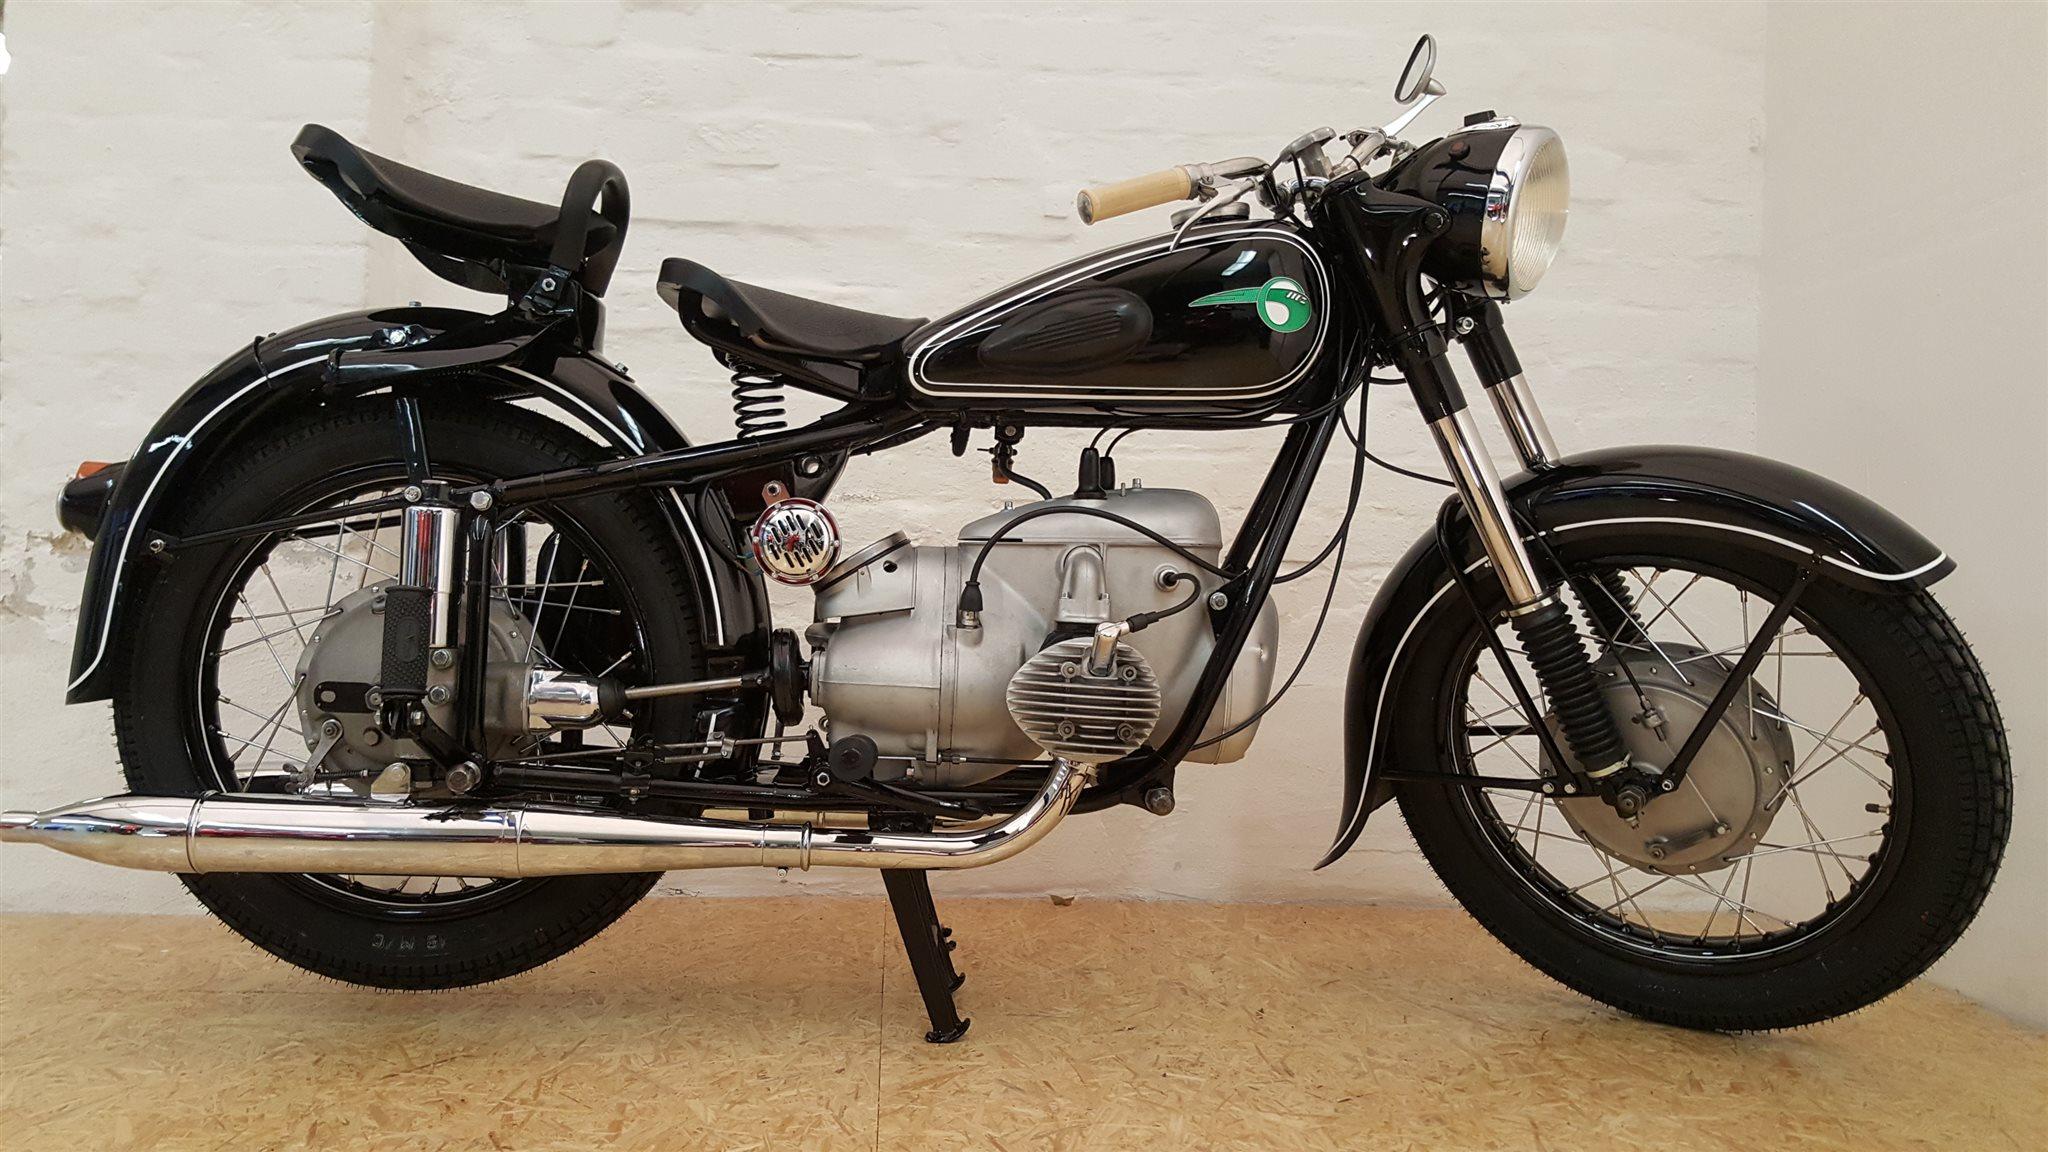 umgebautes motorrad ifa dkw bk 350 von motorrad. Black Bedroom Furniture Sets. Home Design Ideas